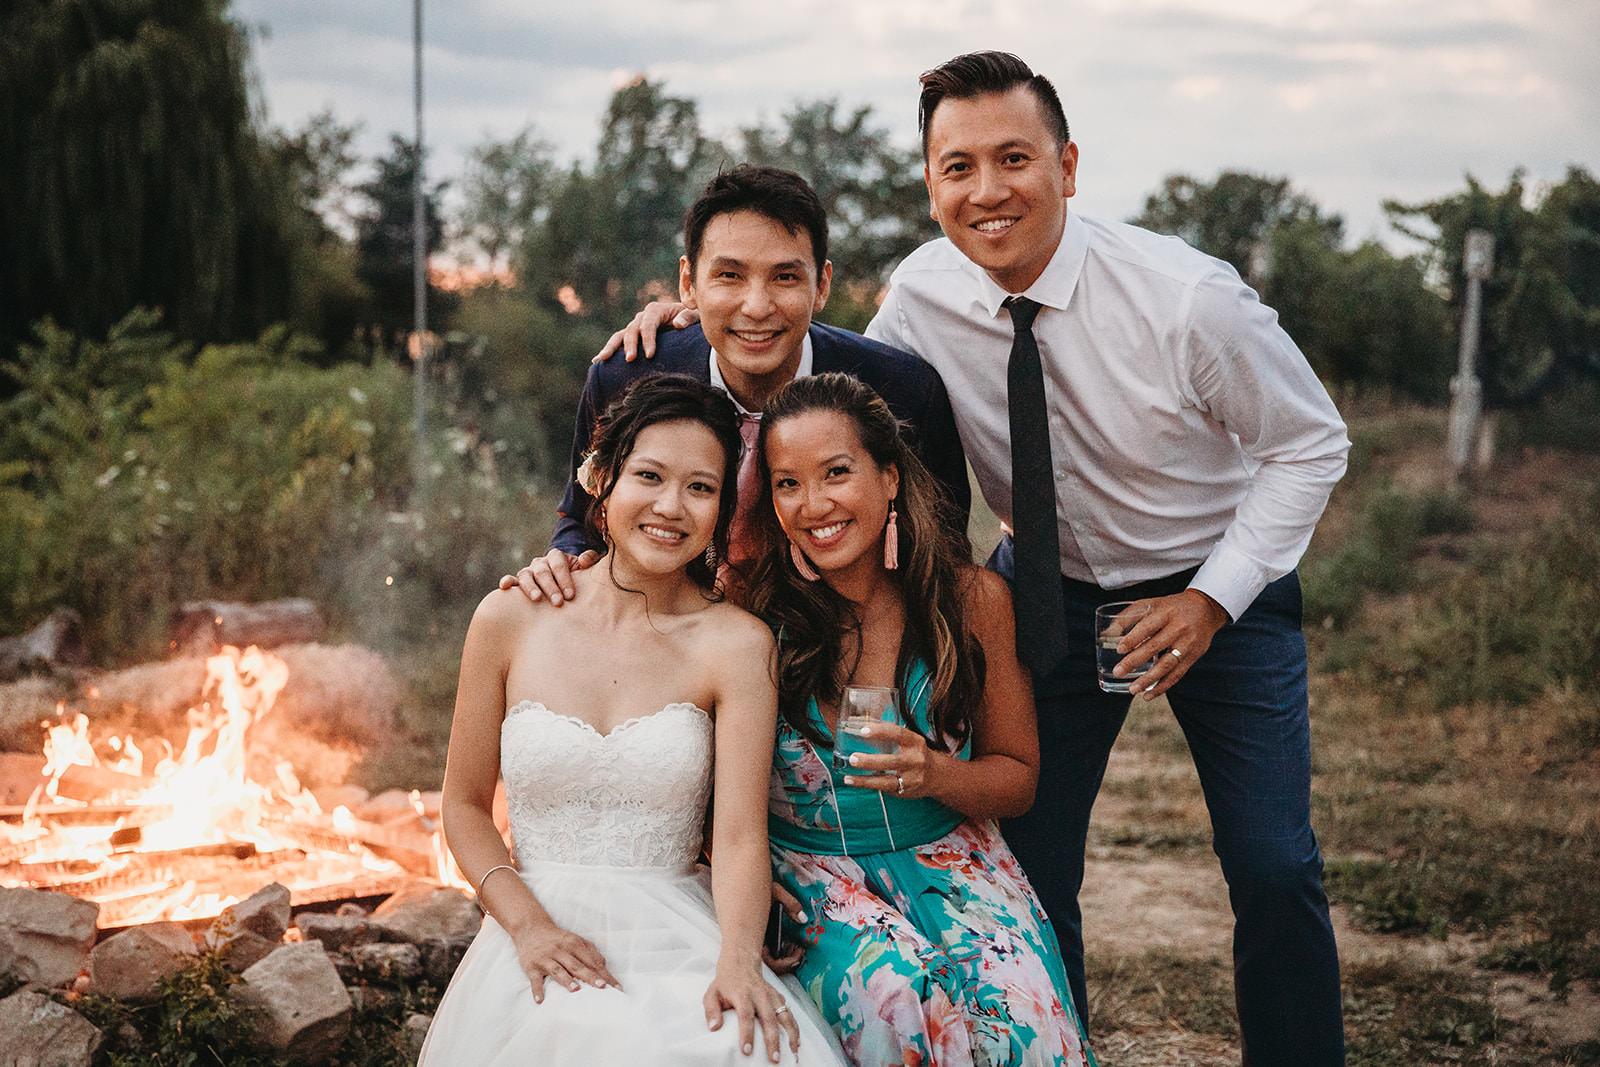 Ravine Vineyard Winery Wedding in Niagara-on-the-Lake